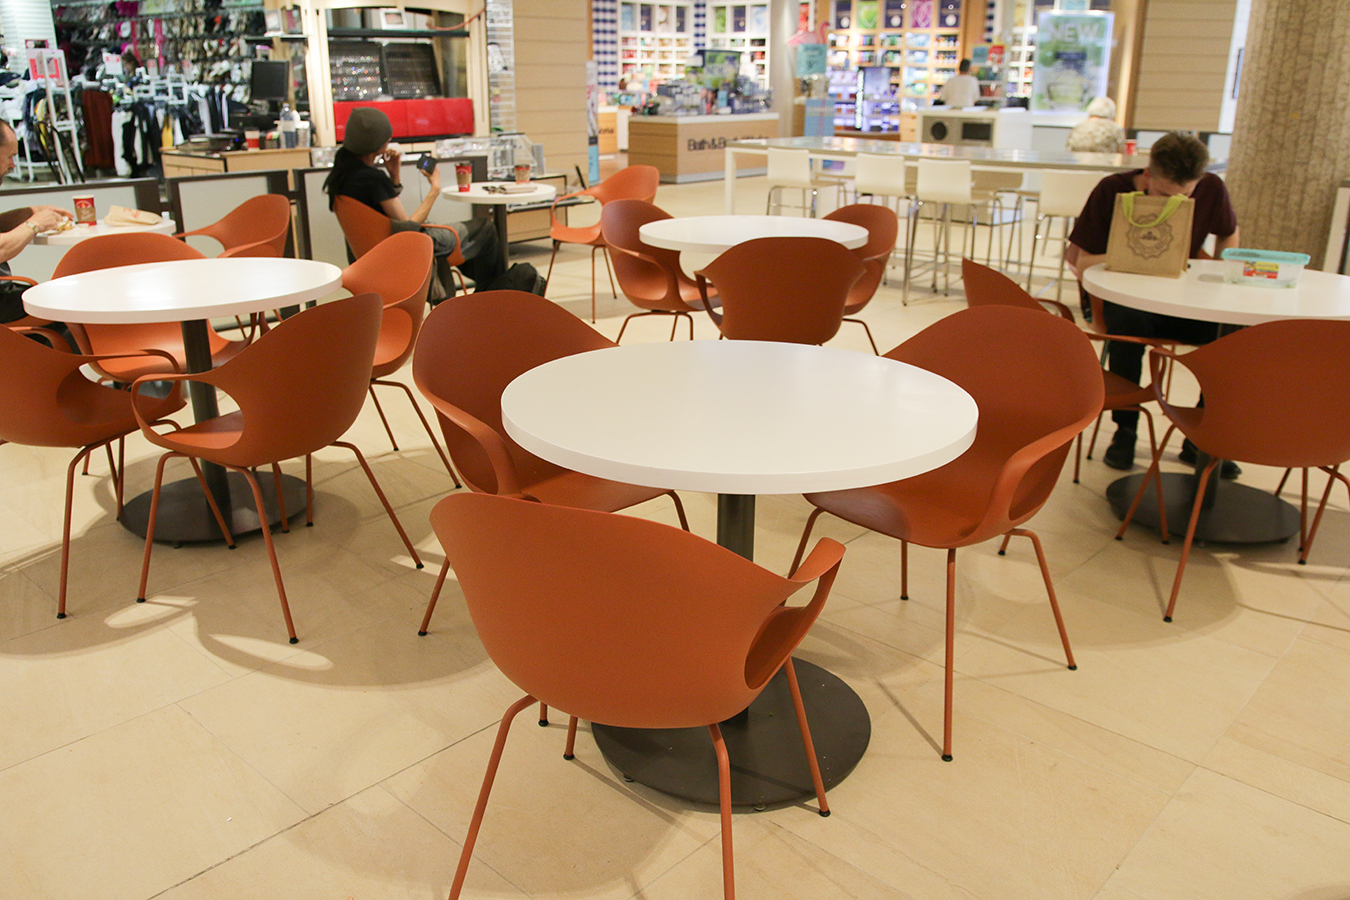 foodcourt5.jpg